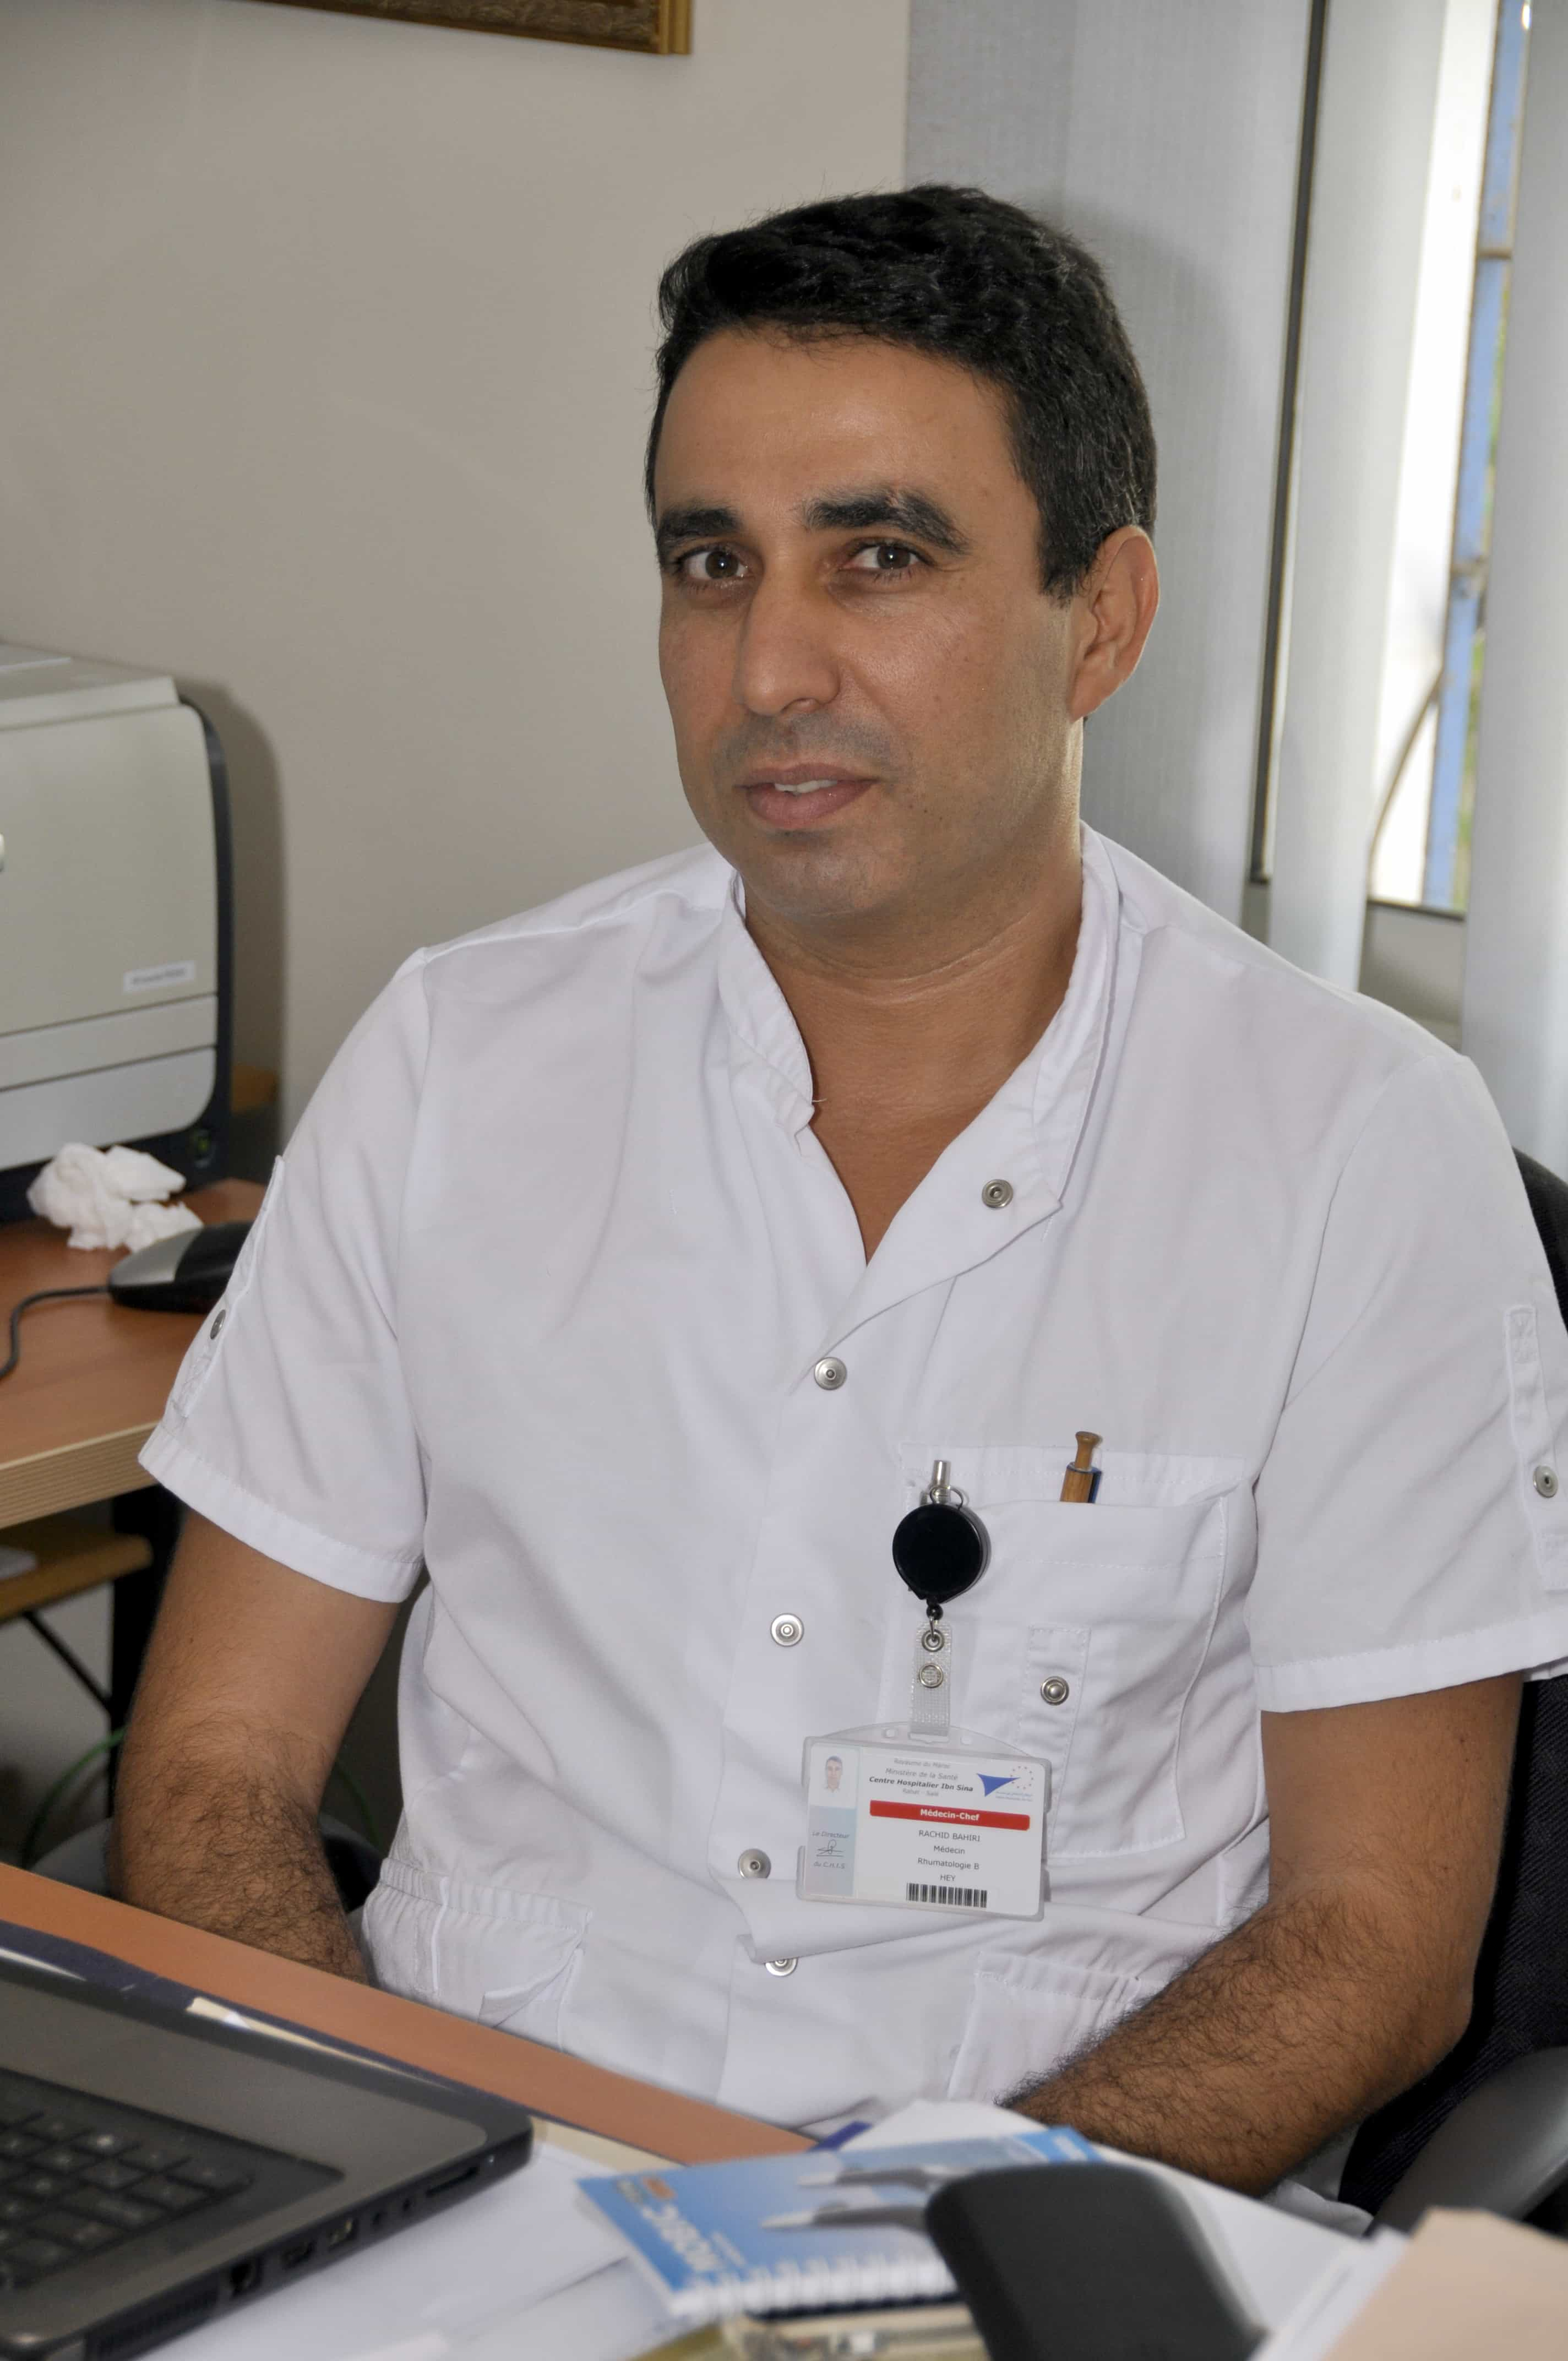 Les maladies rhumatismales dans l'environnement marocain